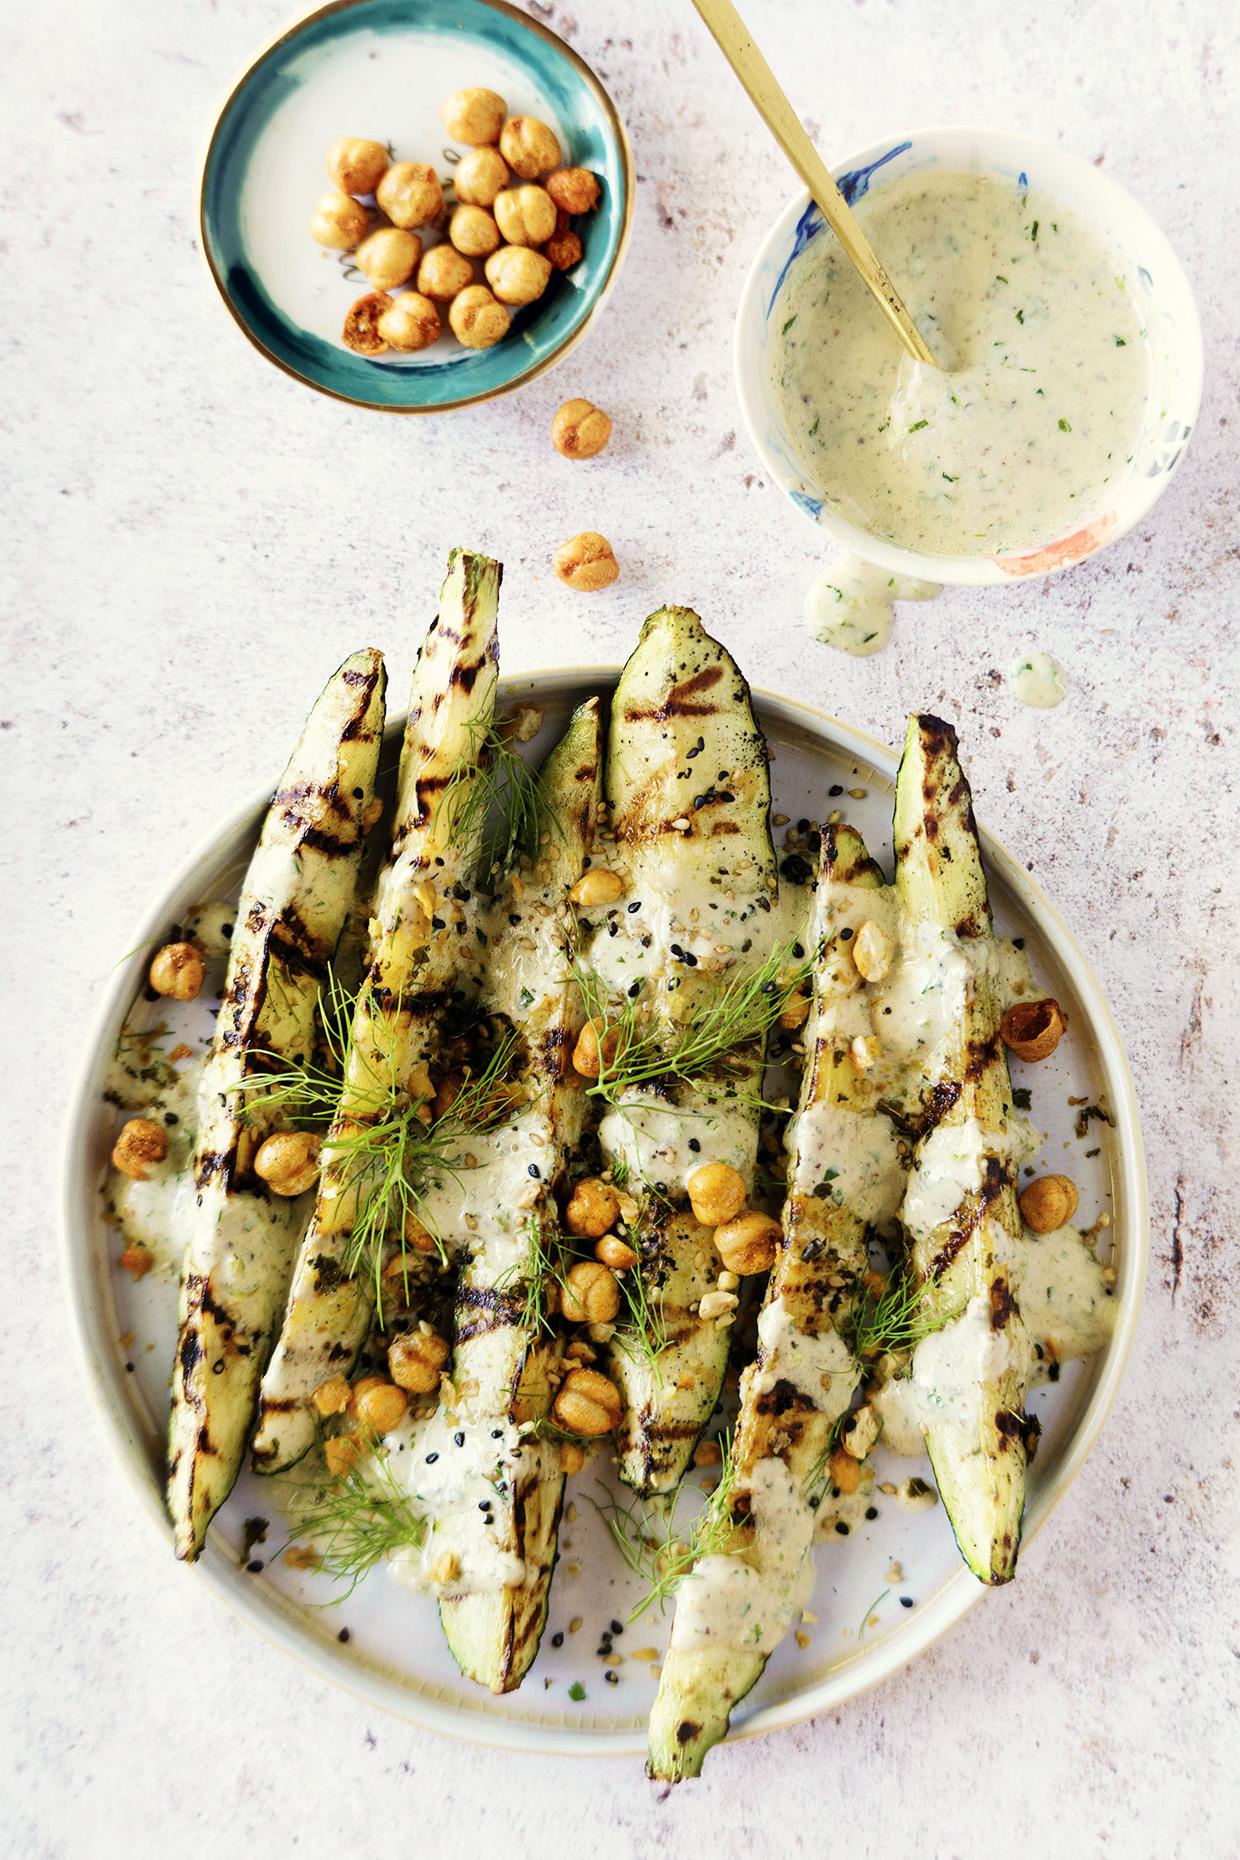 Grilled Zucchini with Savory Yogurt Sauce